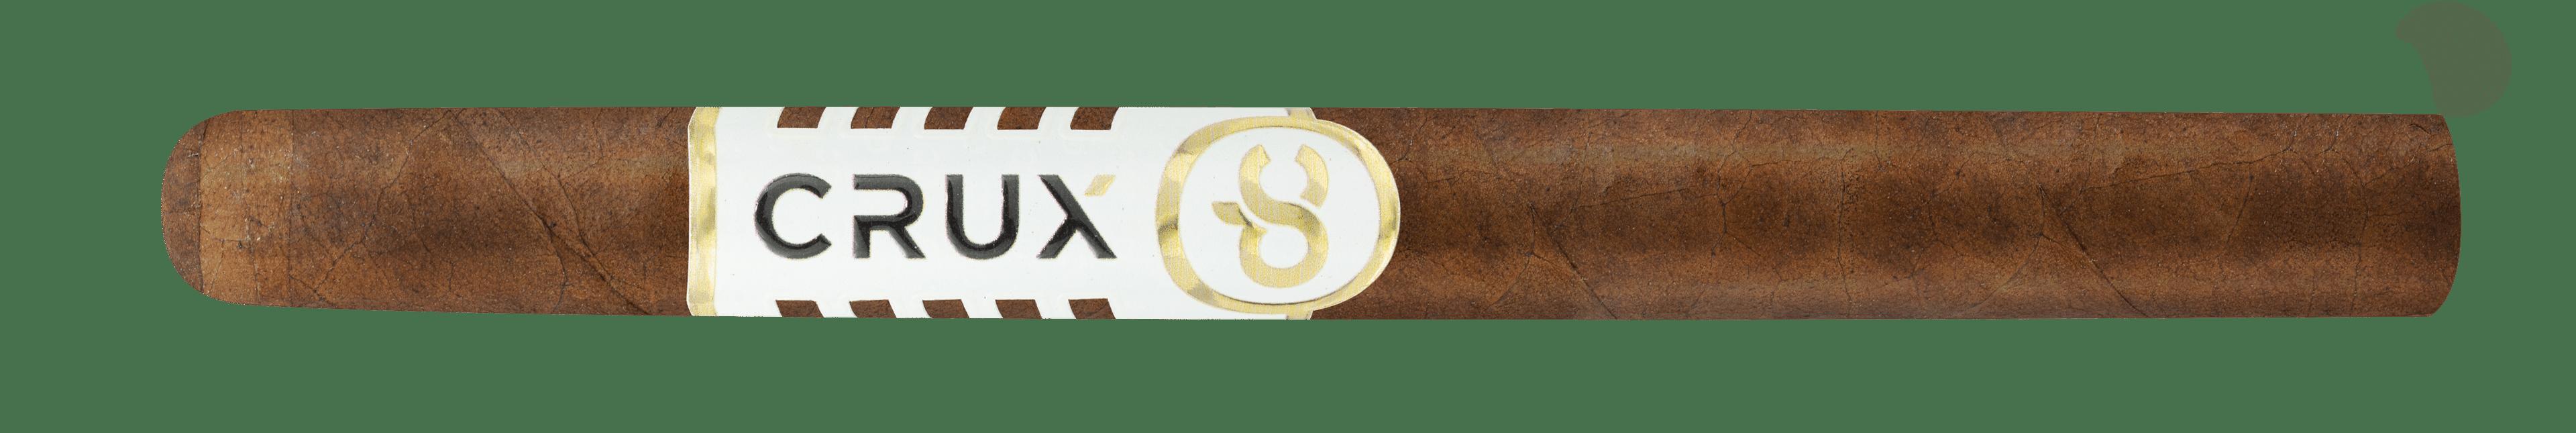 Crux Brings Back Du Connoisseur - Cigar News